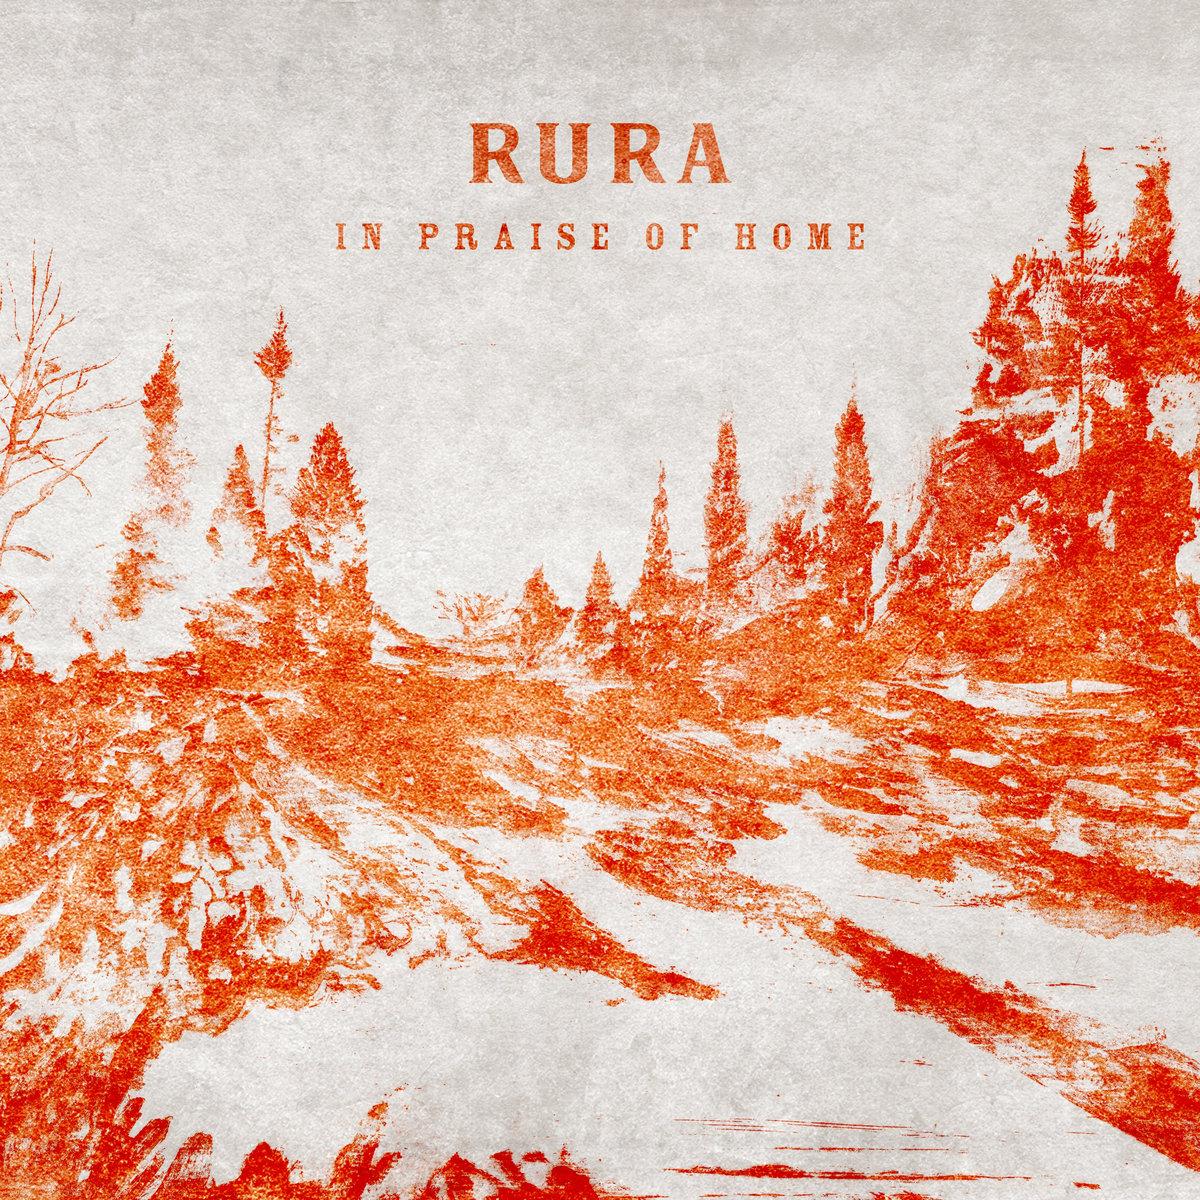 In Praise of Home | RURA